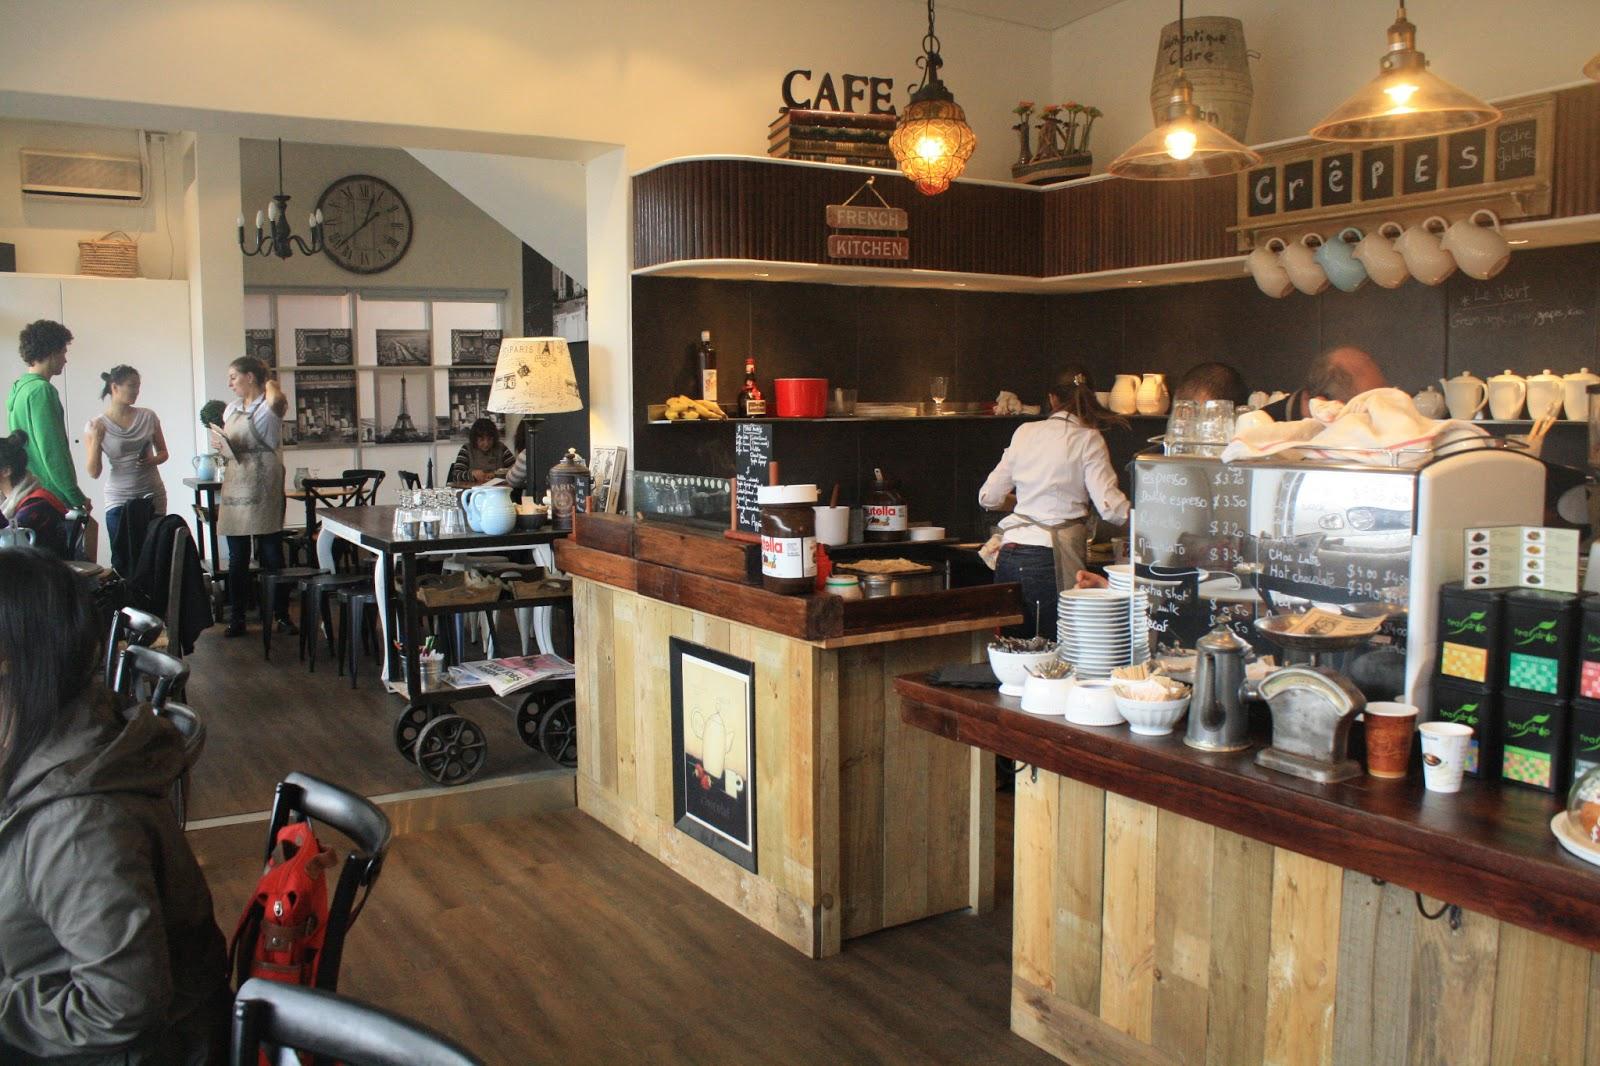 Le Carpe Diem, Adelaide, Food, Crepes, Grenfell Street